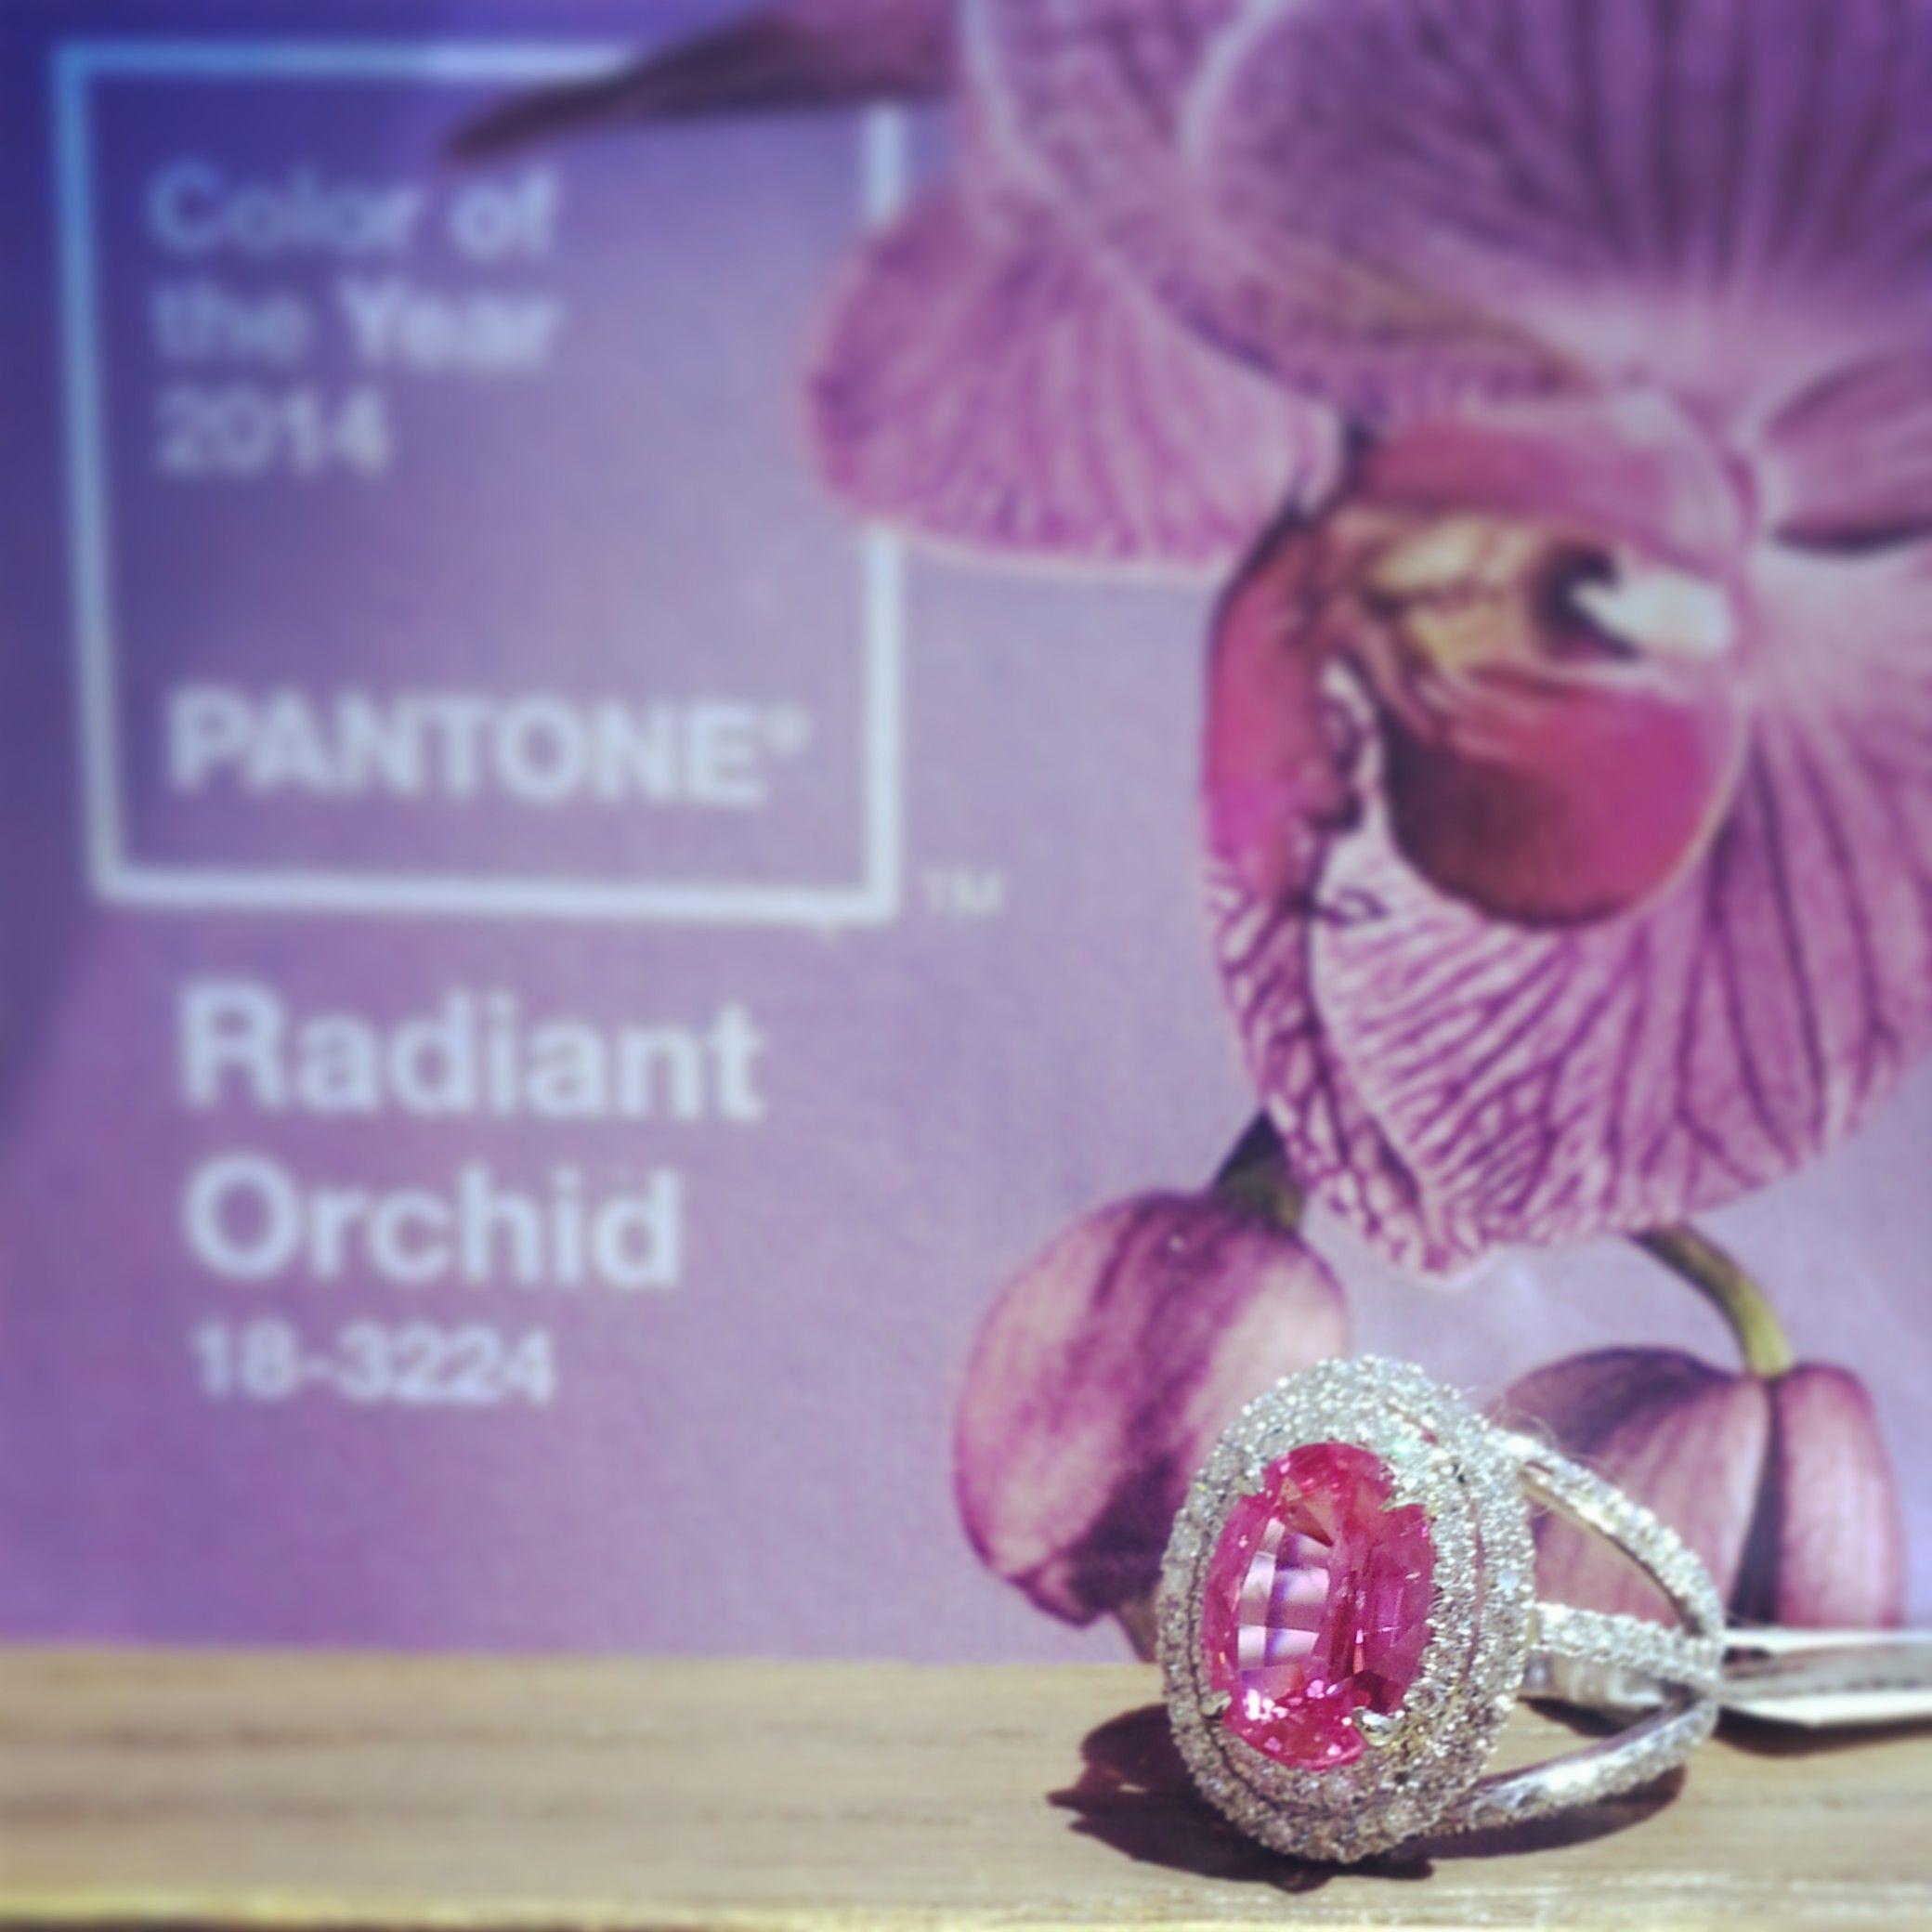 #radiantorchid #jewelry #diamond #pinktourmaline #ring #whitegold